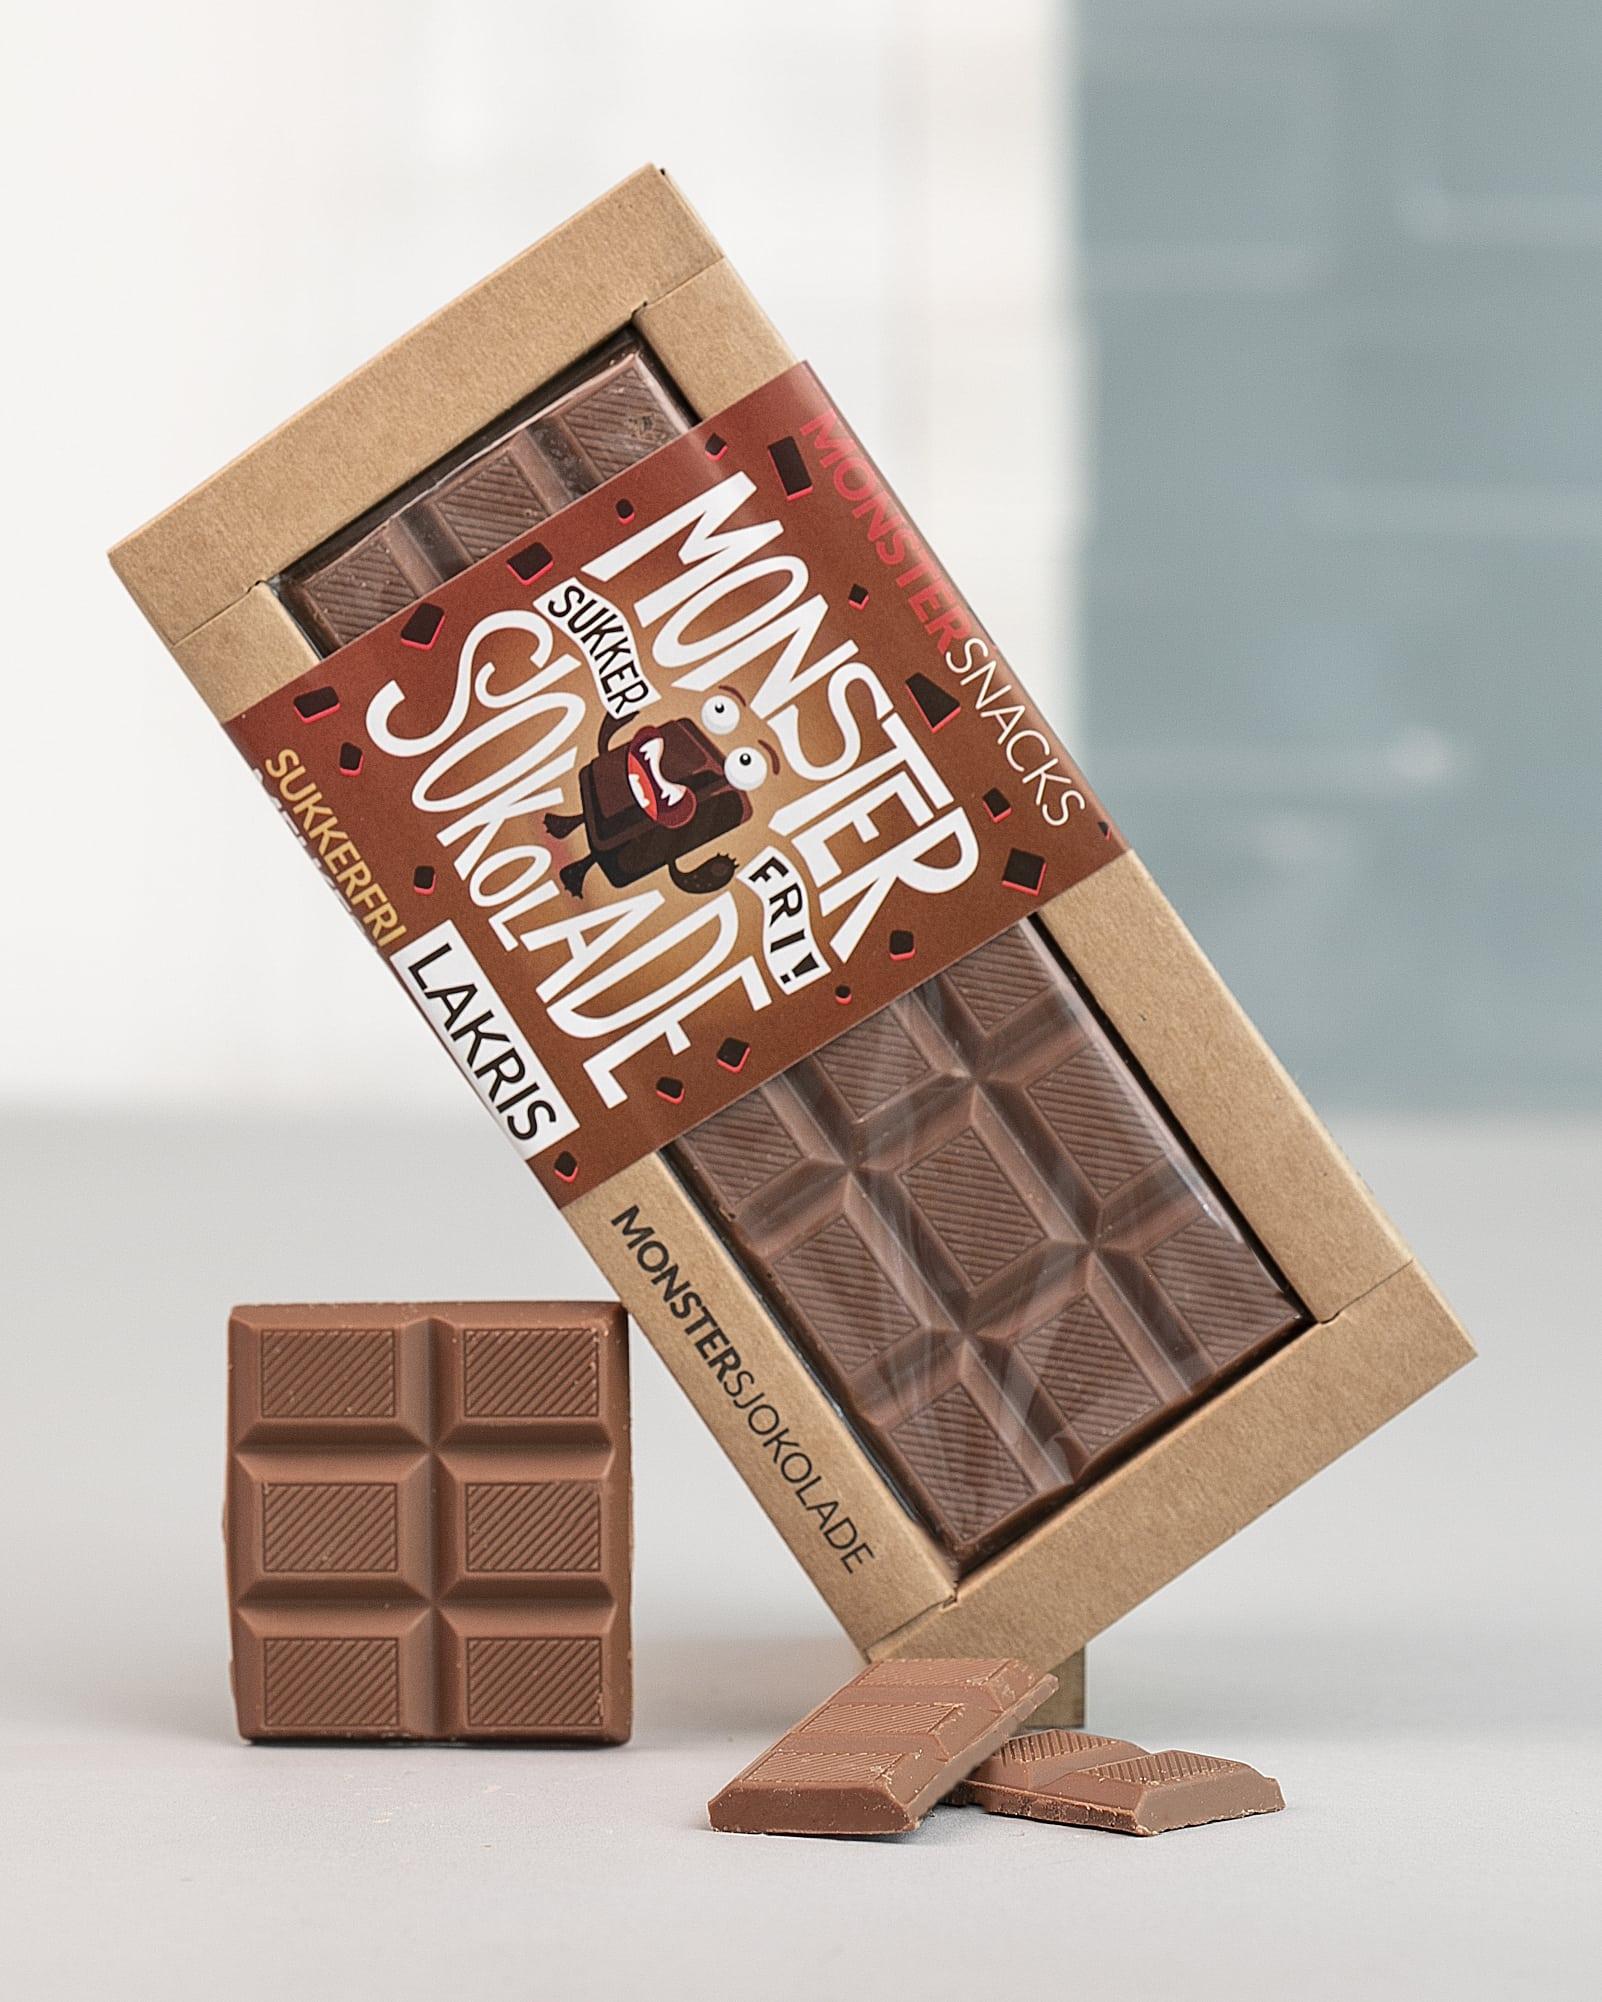 lakris sjokolade